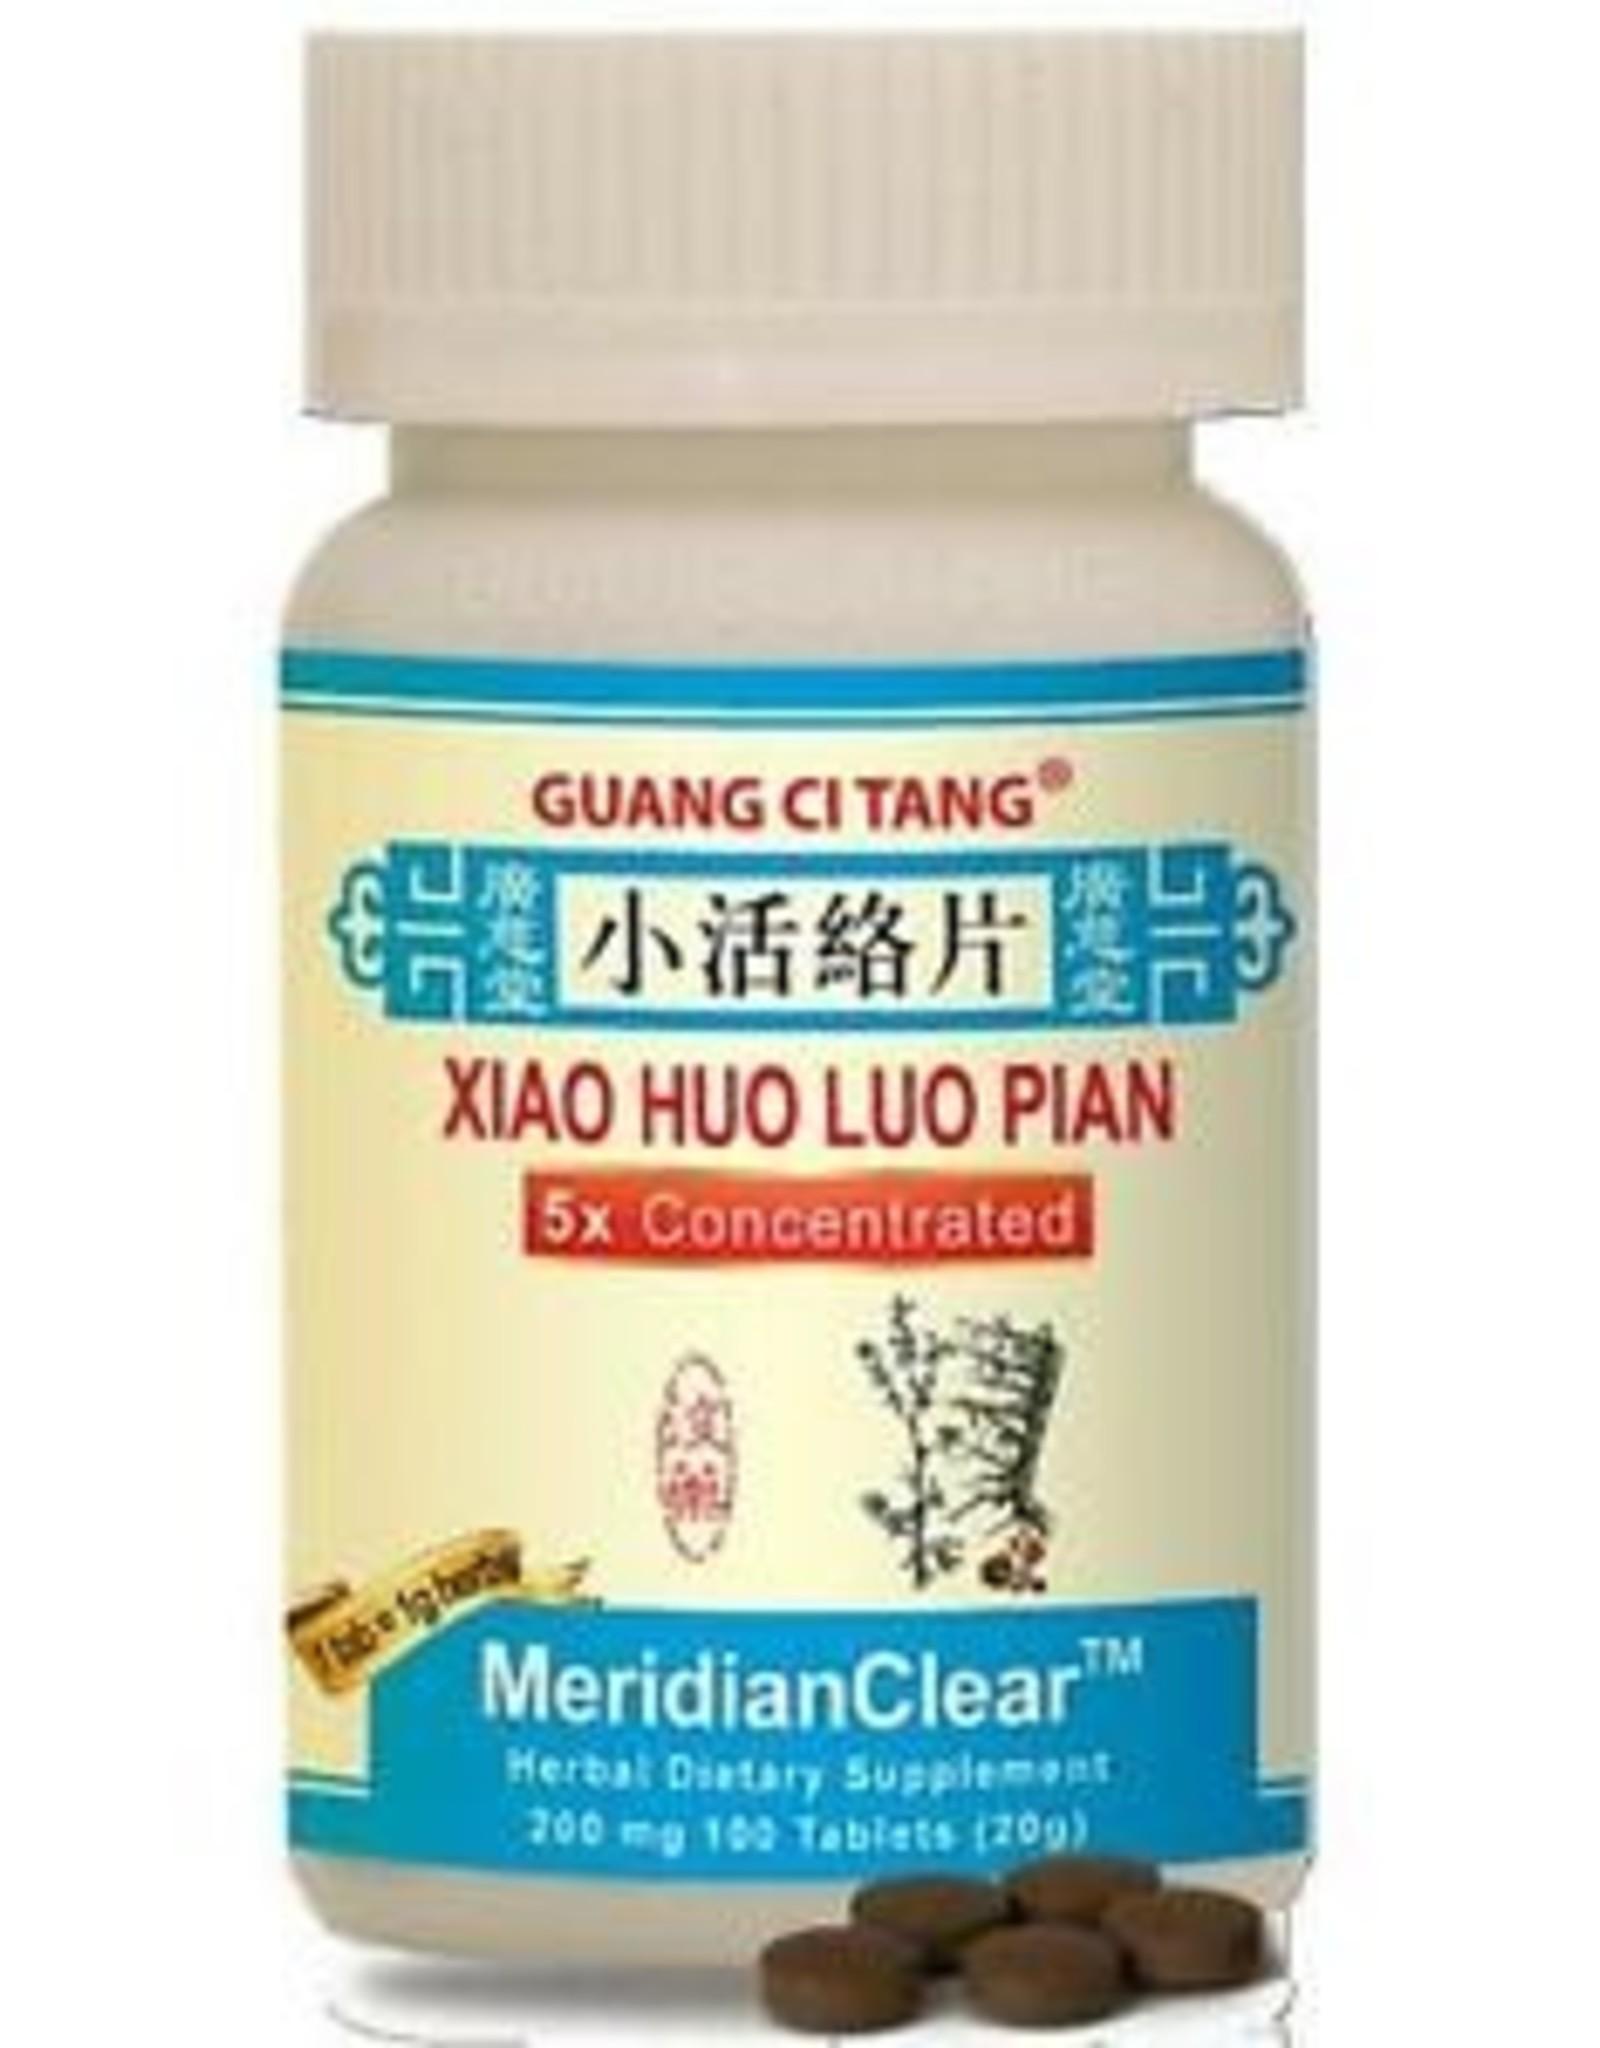 Guang Ci Tang MeridianClear